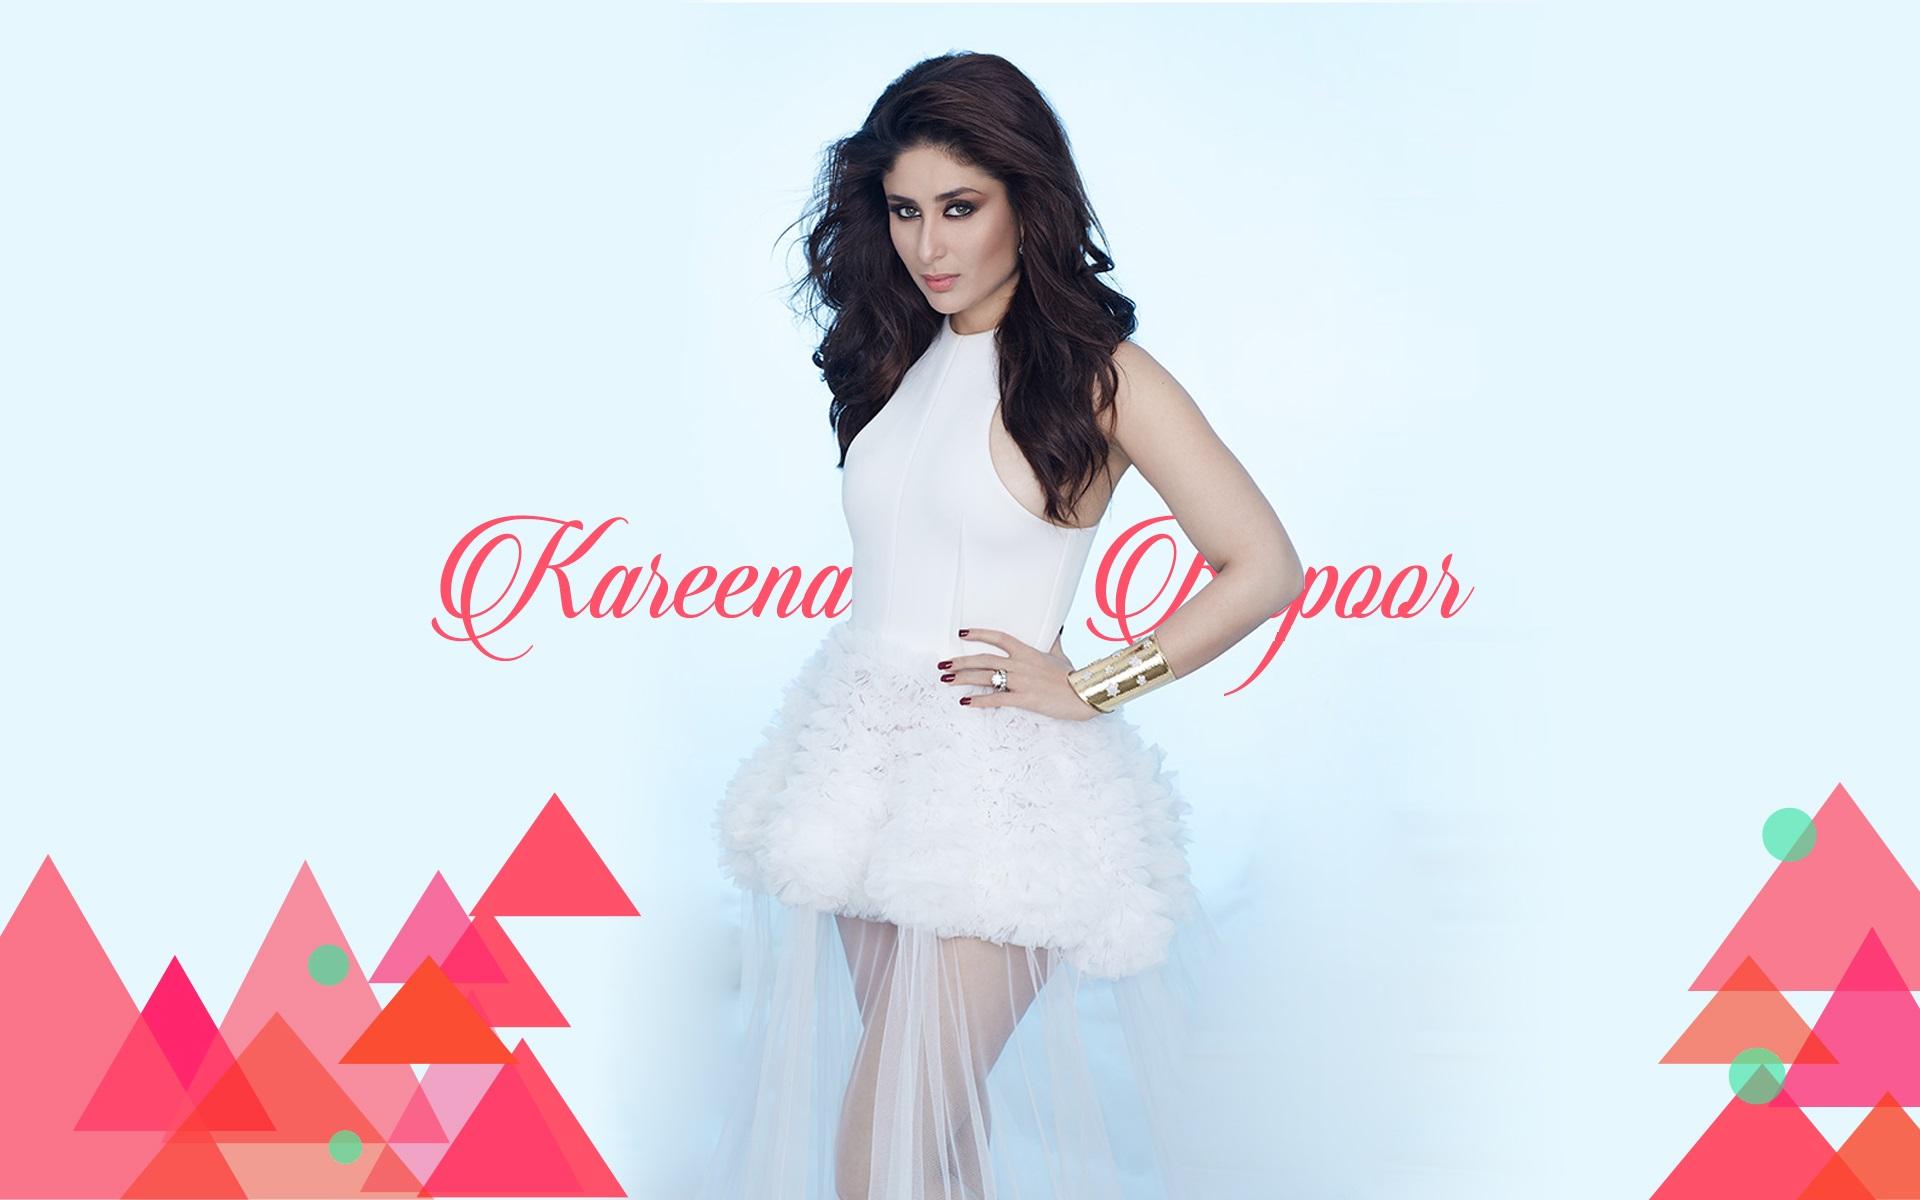 Kareena Kapoor Beautiful HD Wallpaper 2015 1920x1200